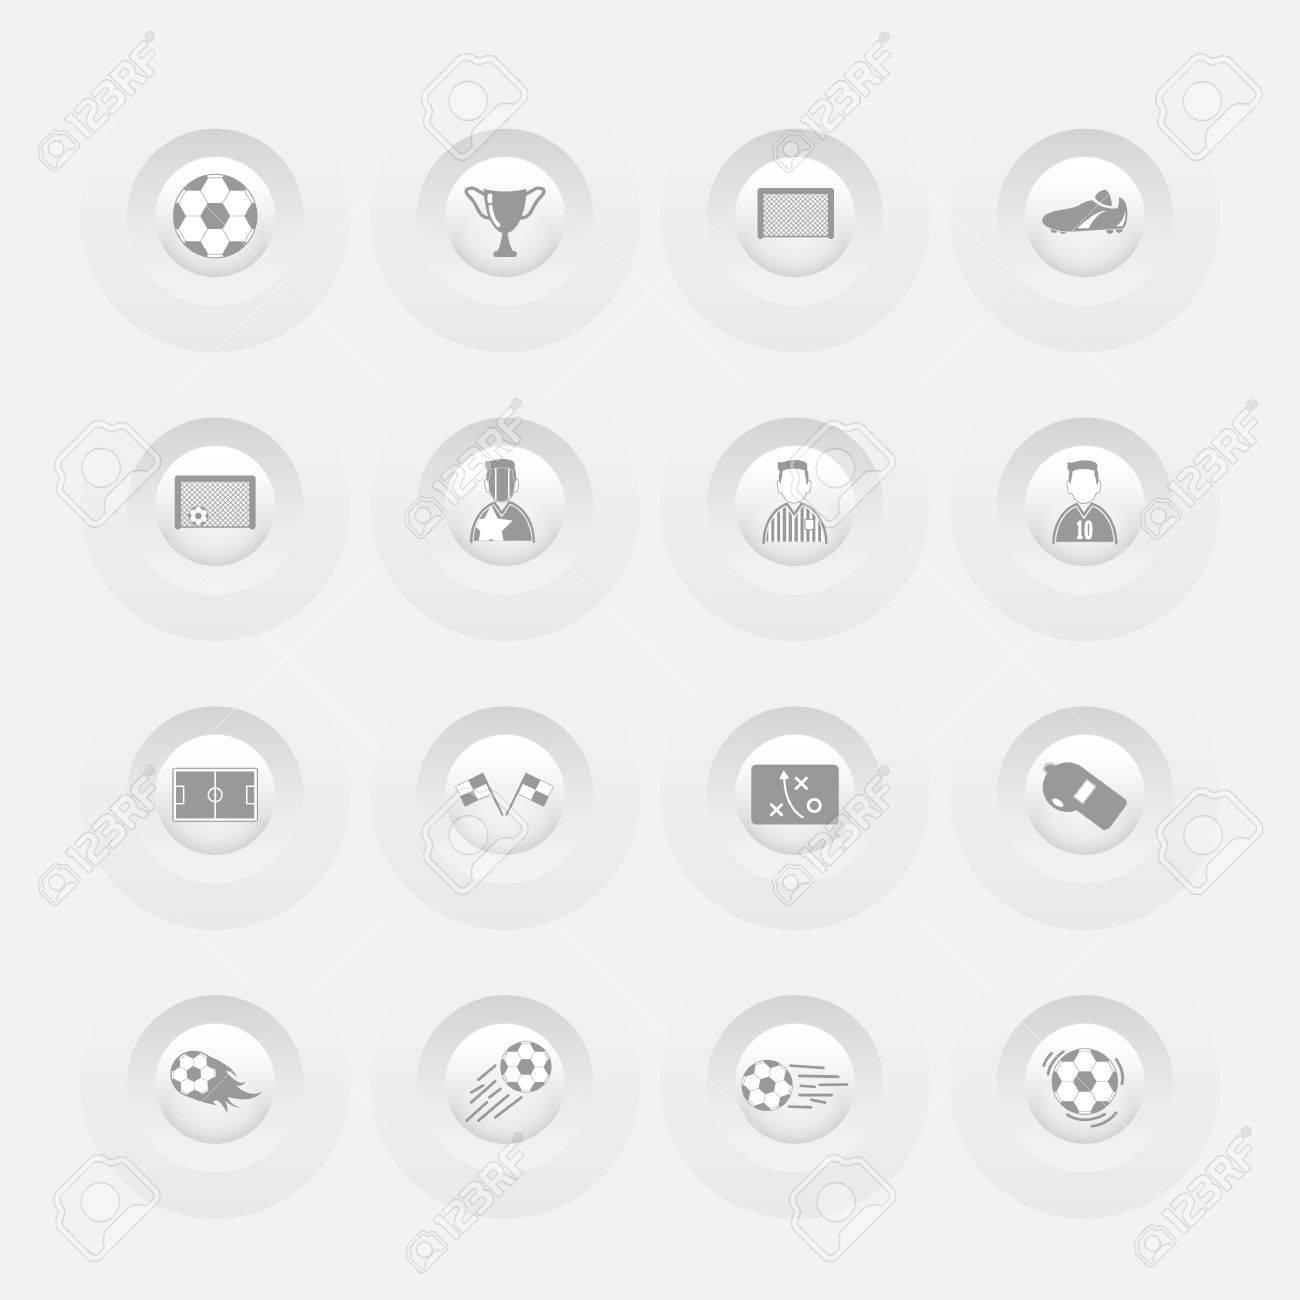 Button-Soccer Icons Web-Design-Menü-Vorlage Lizenzfrei Nutzbare ...